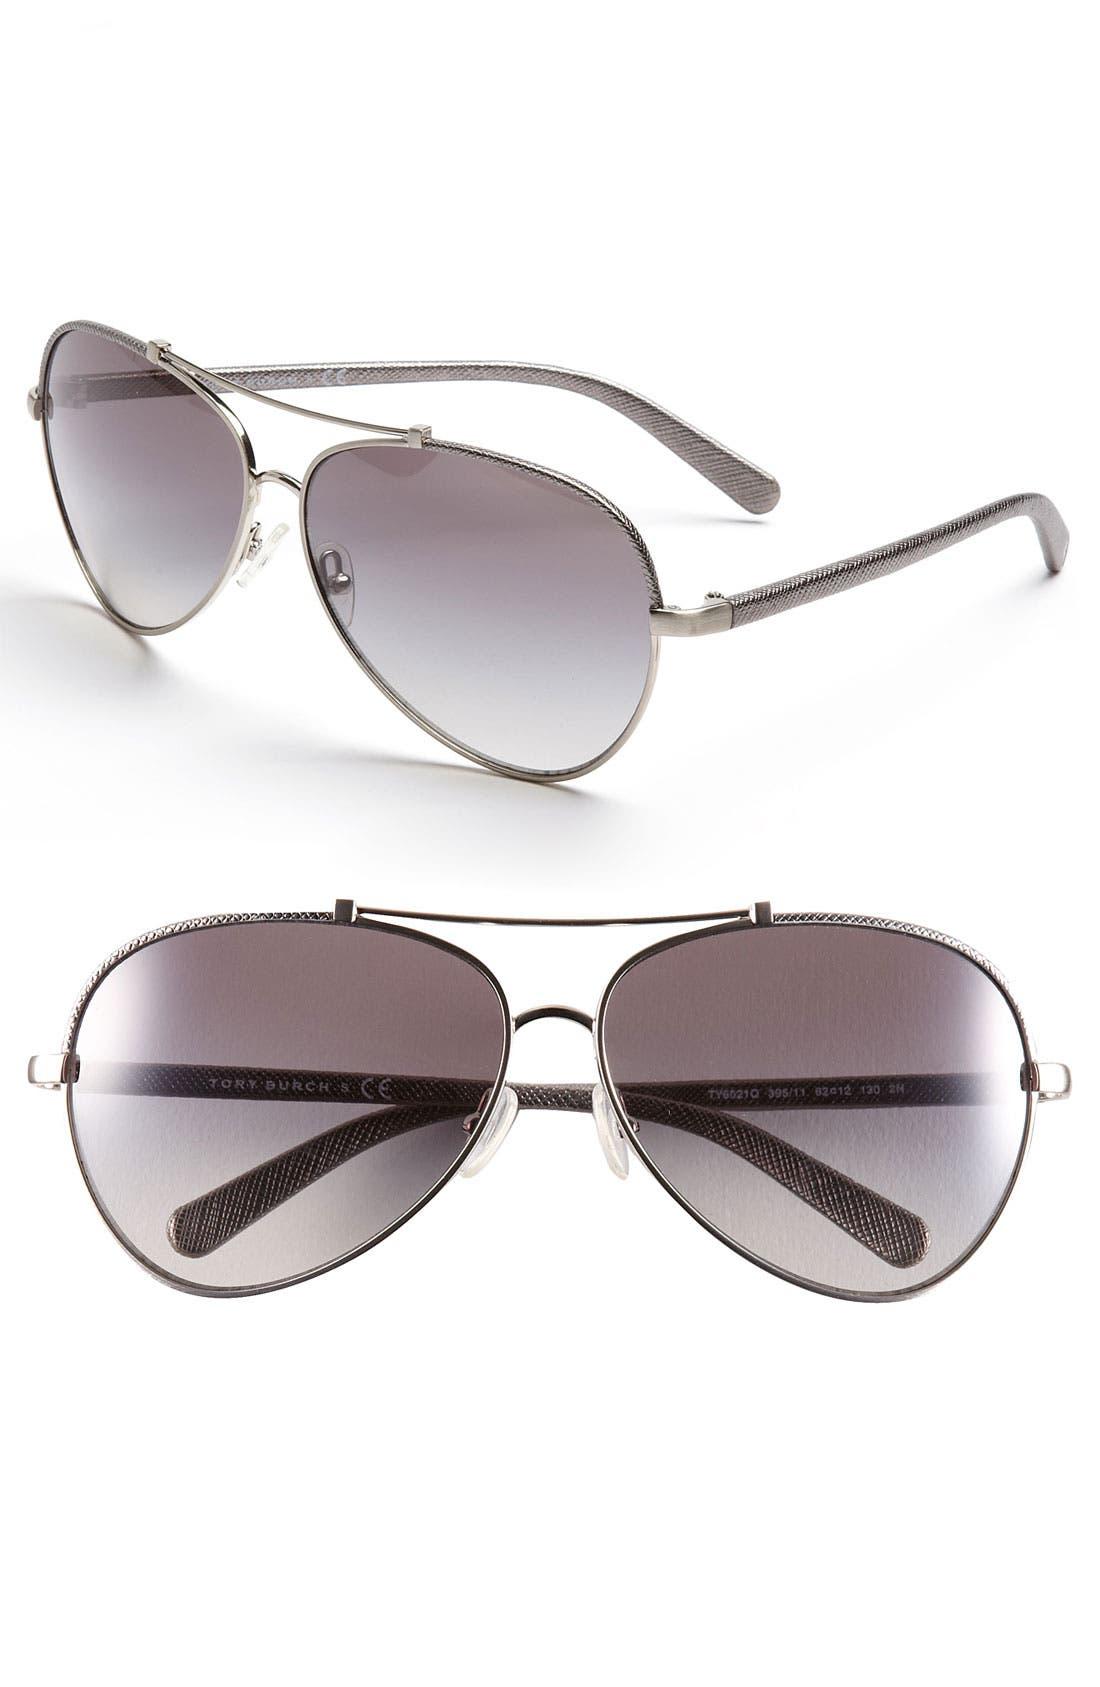 Alternate Image 1 Selected - Tory Burch 62mm Aviator Sunglasses